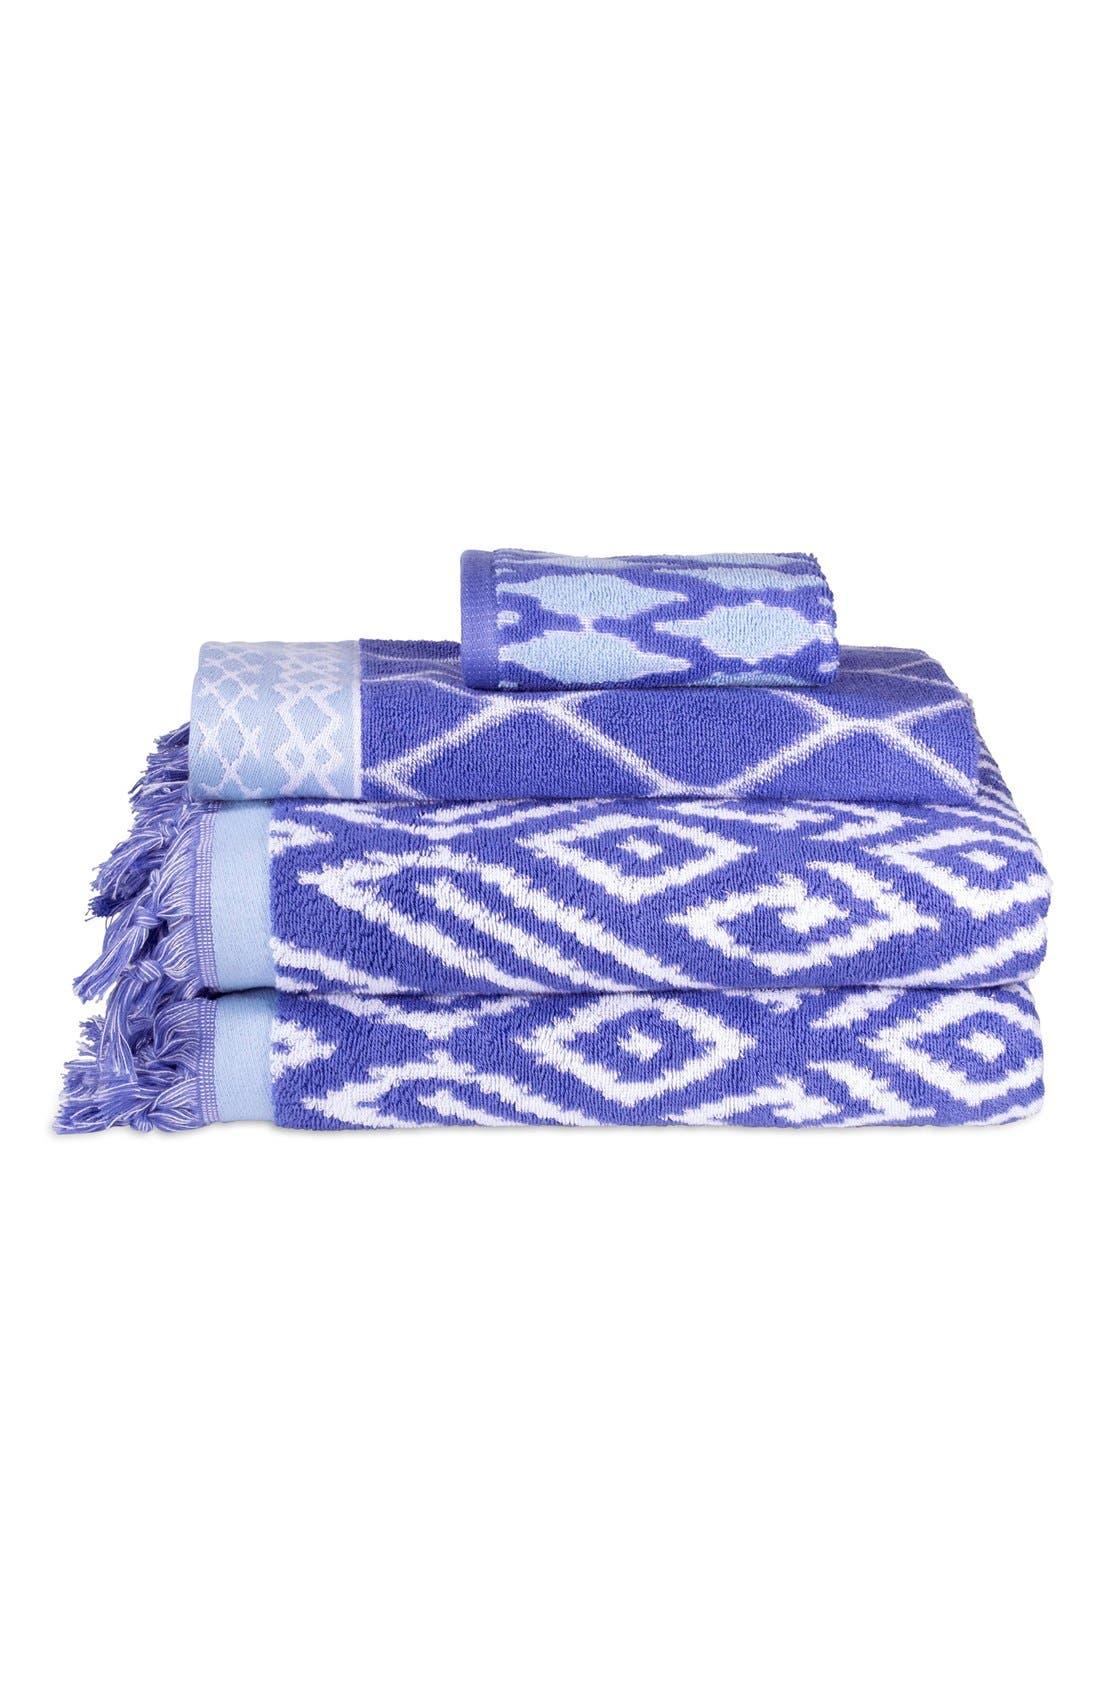 'Kalasin' Turkish Cotton Bath Towel,                         Main,                         color, 430